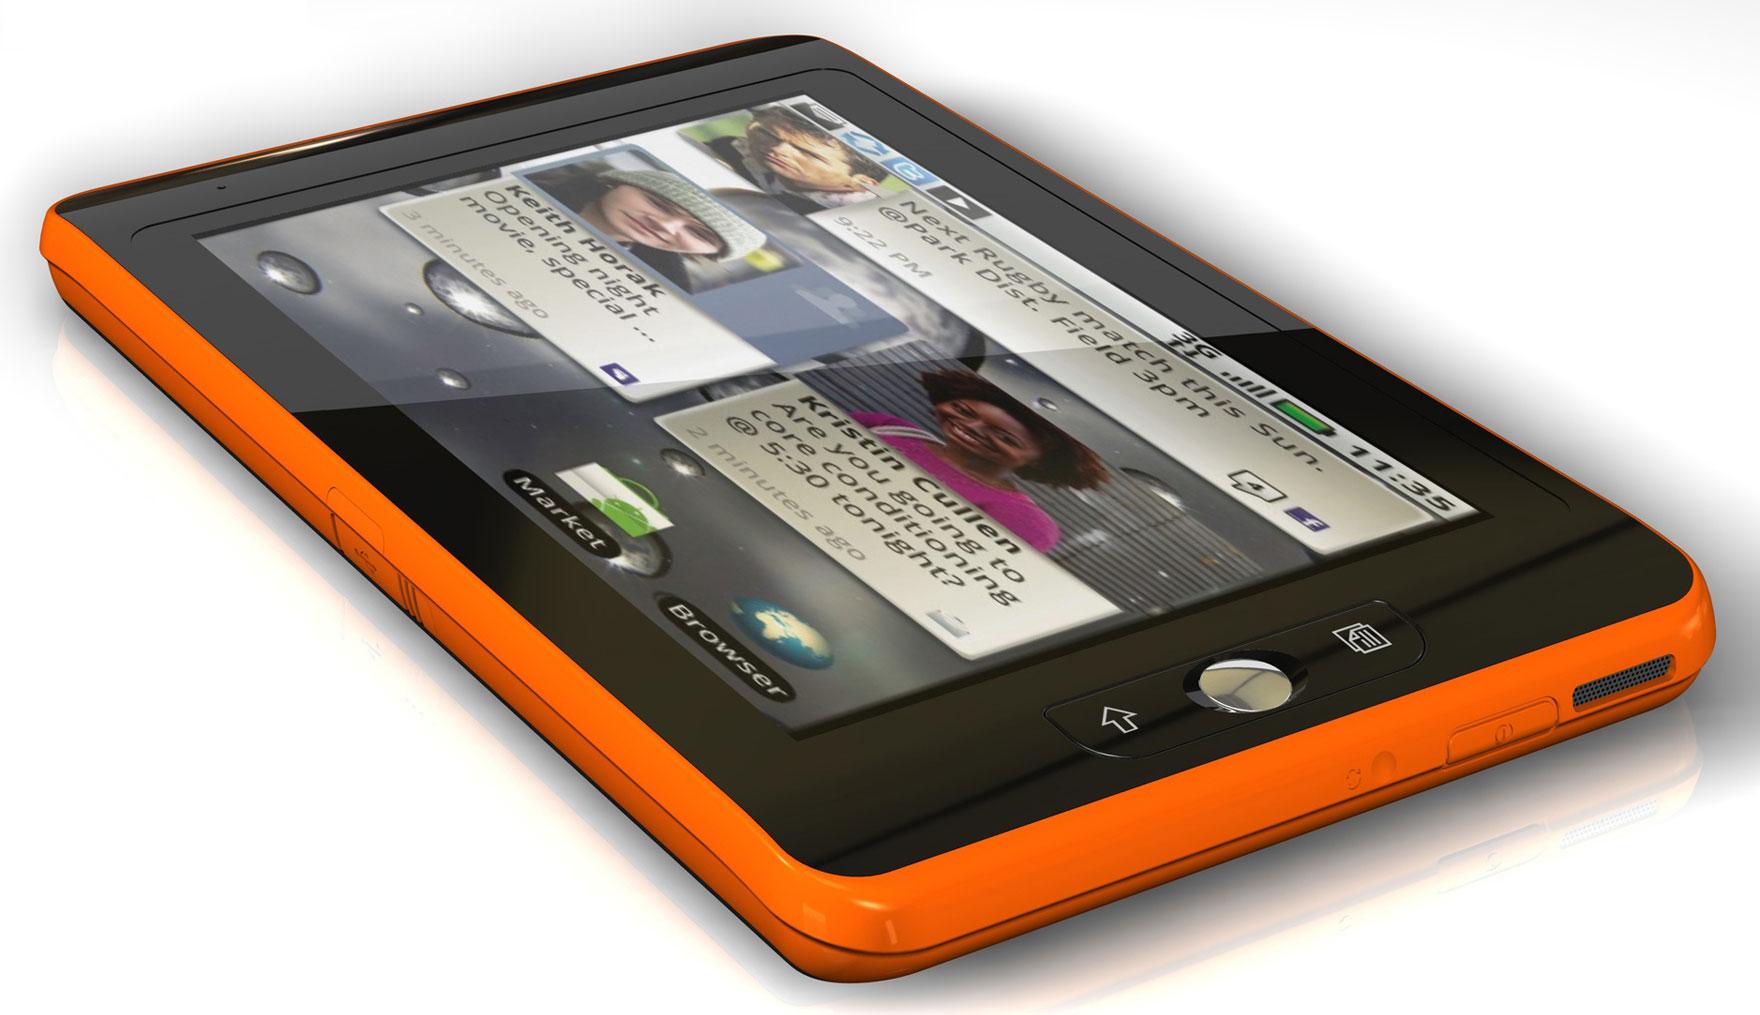 mitac android tablets f r den strand und unterwegs screenshots. Black Bedroom Furniture Sets. Home Design Ideas